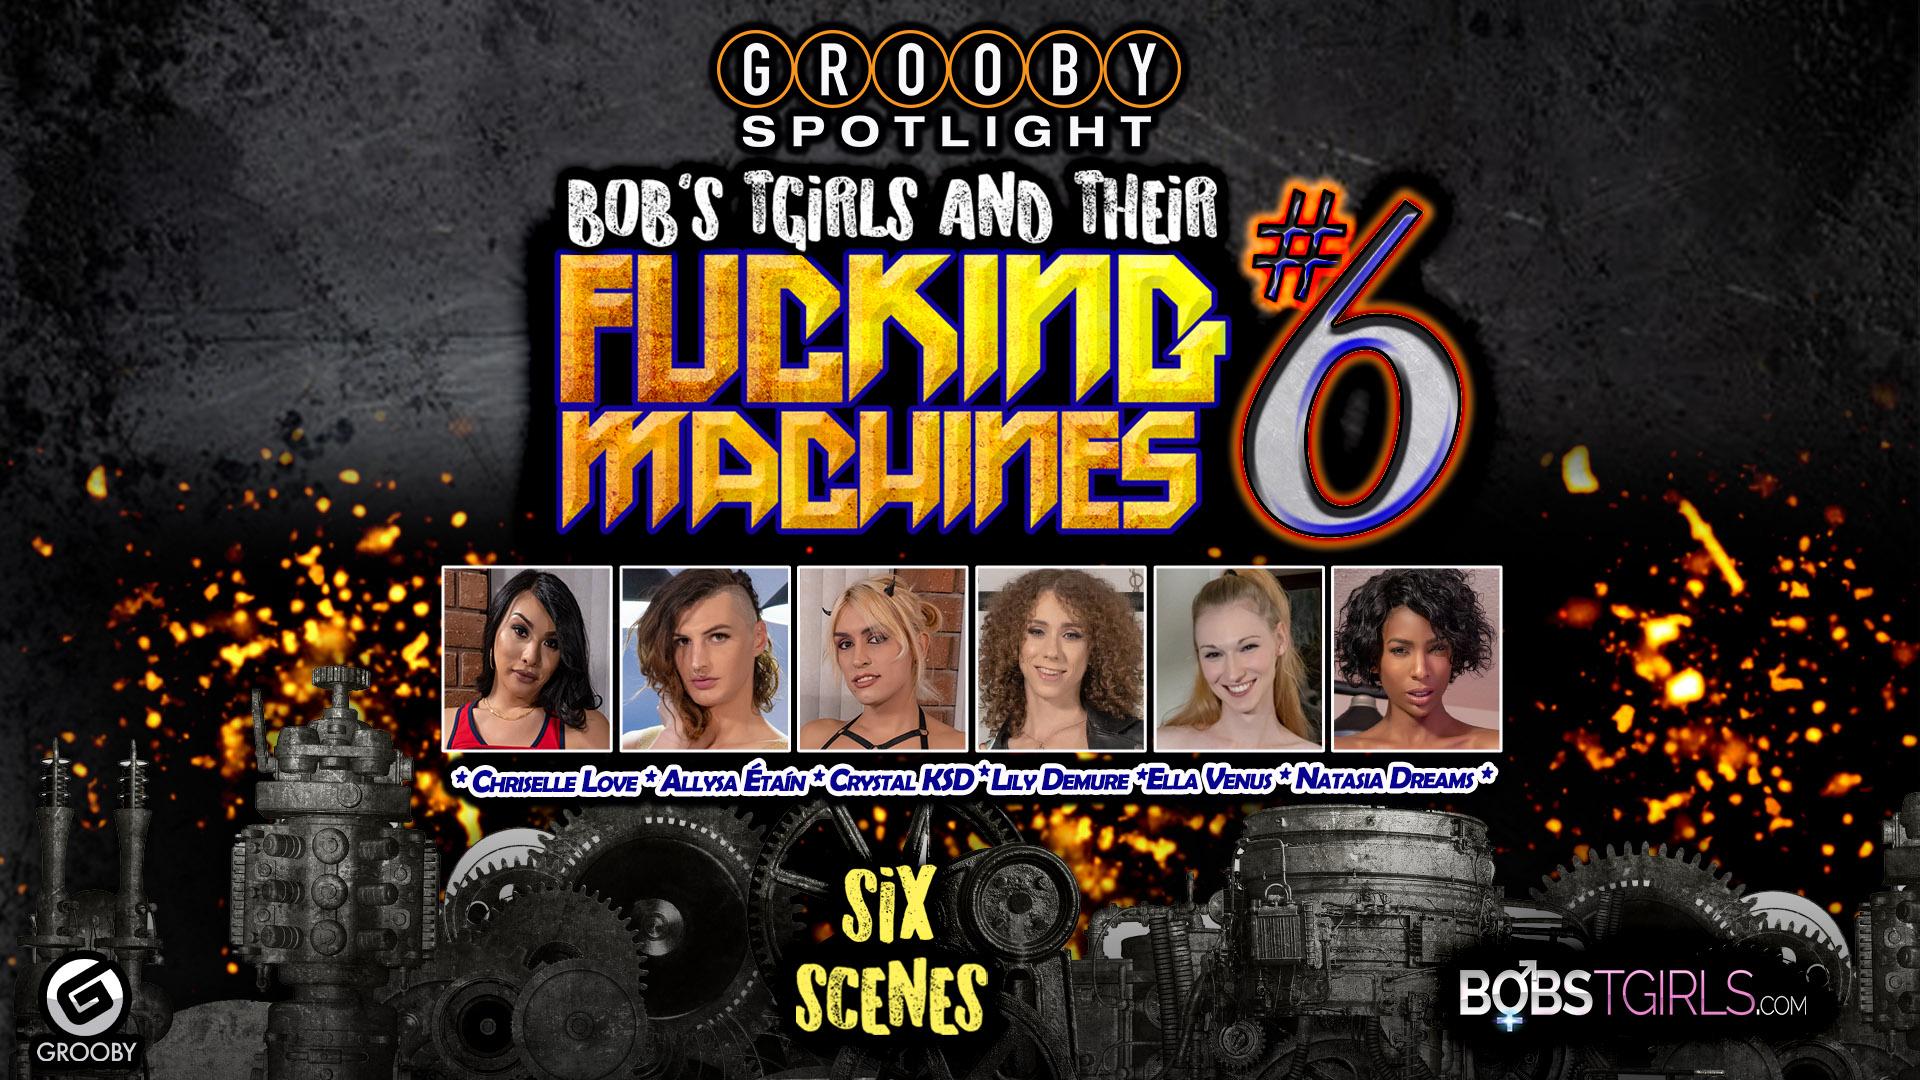 Bob's Tgirls and Their Fucking Machines #6 - DVD Trailer